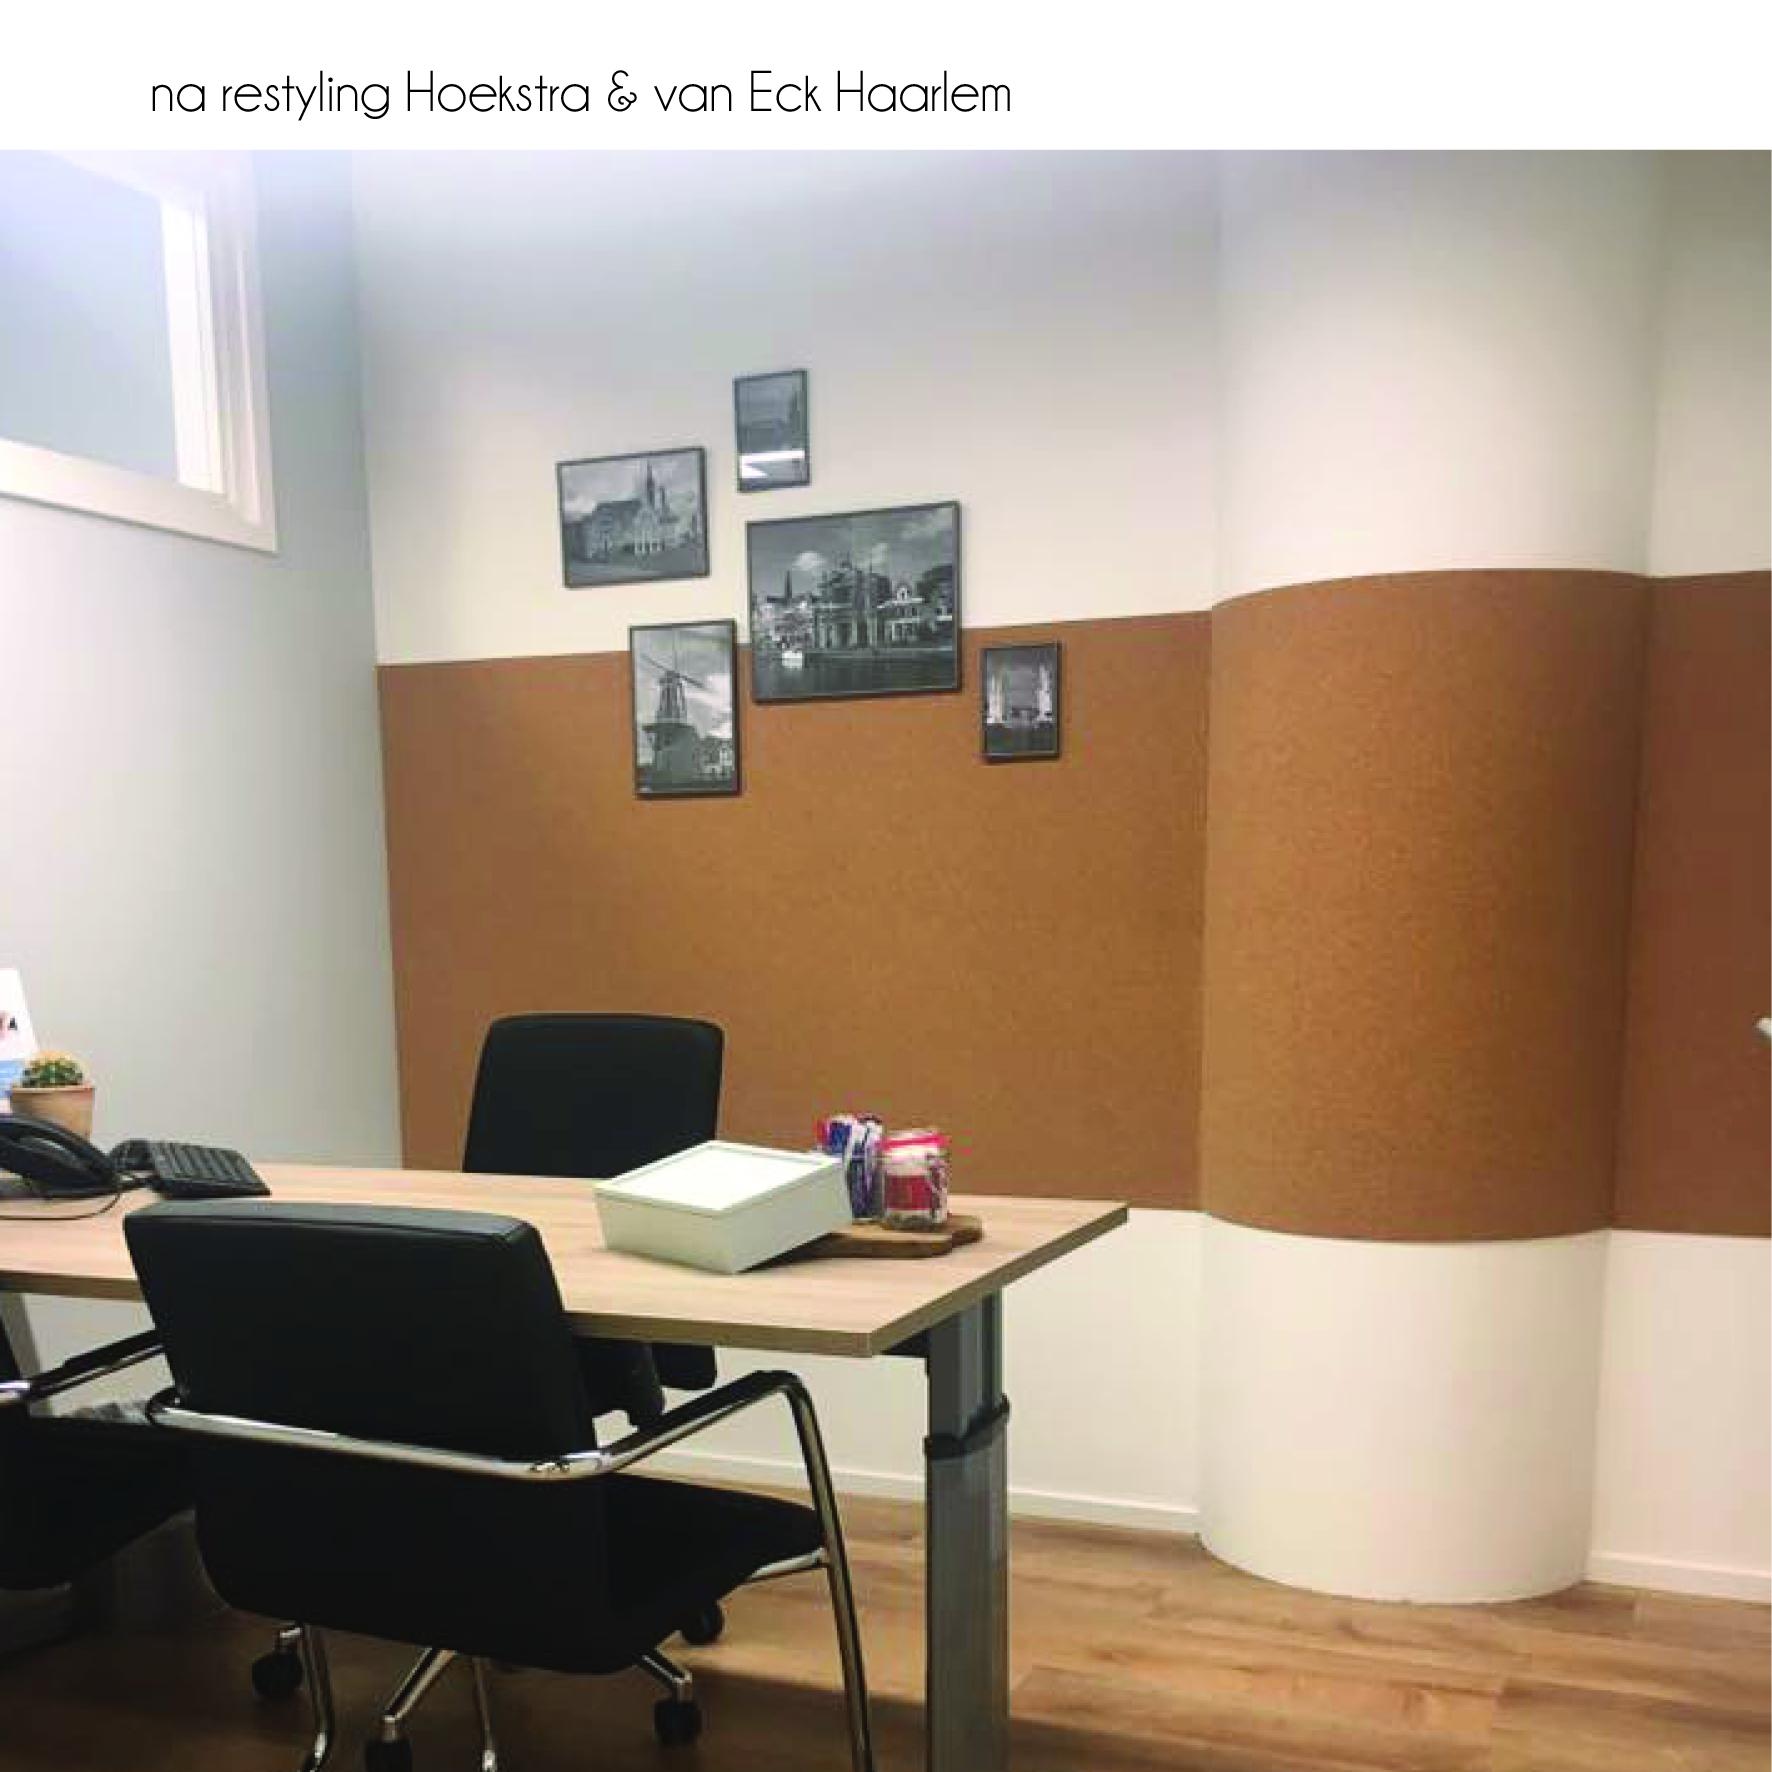 kantoorstyling